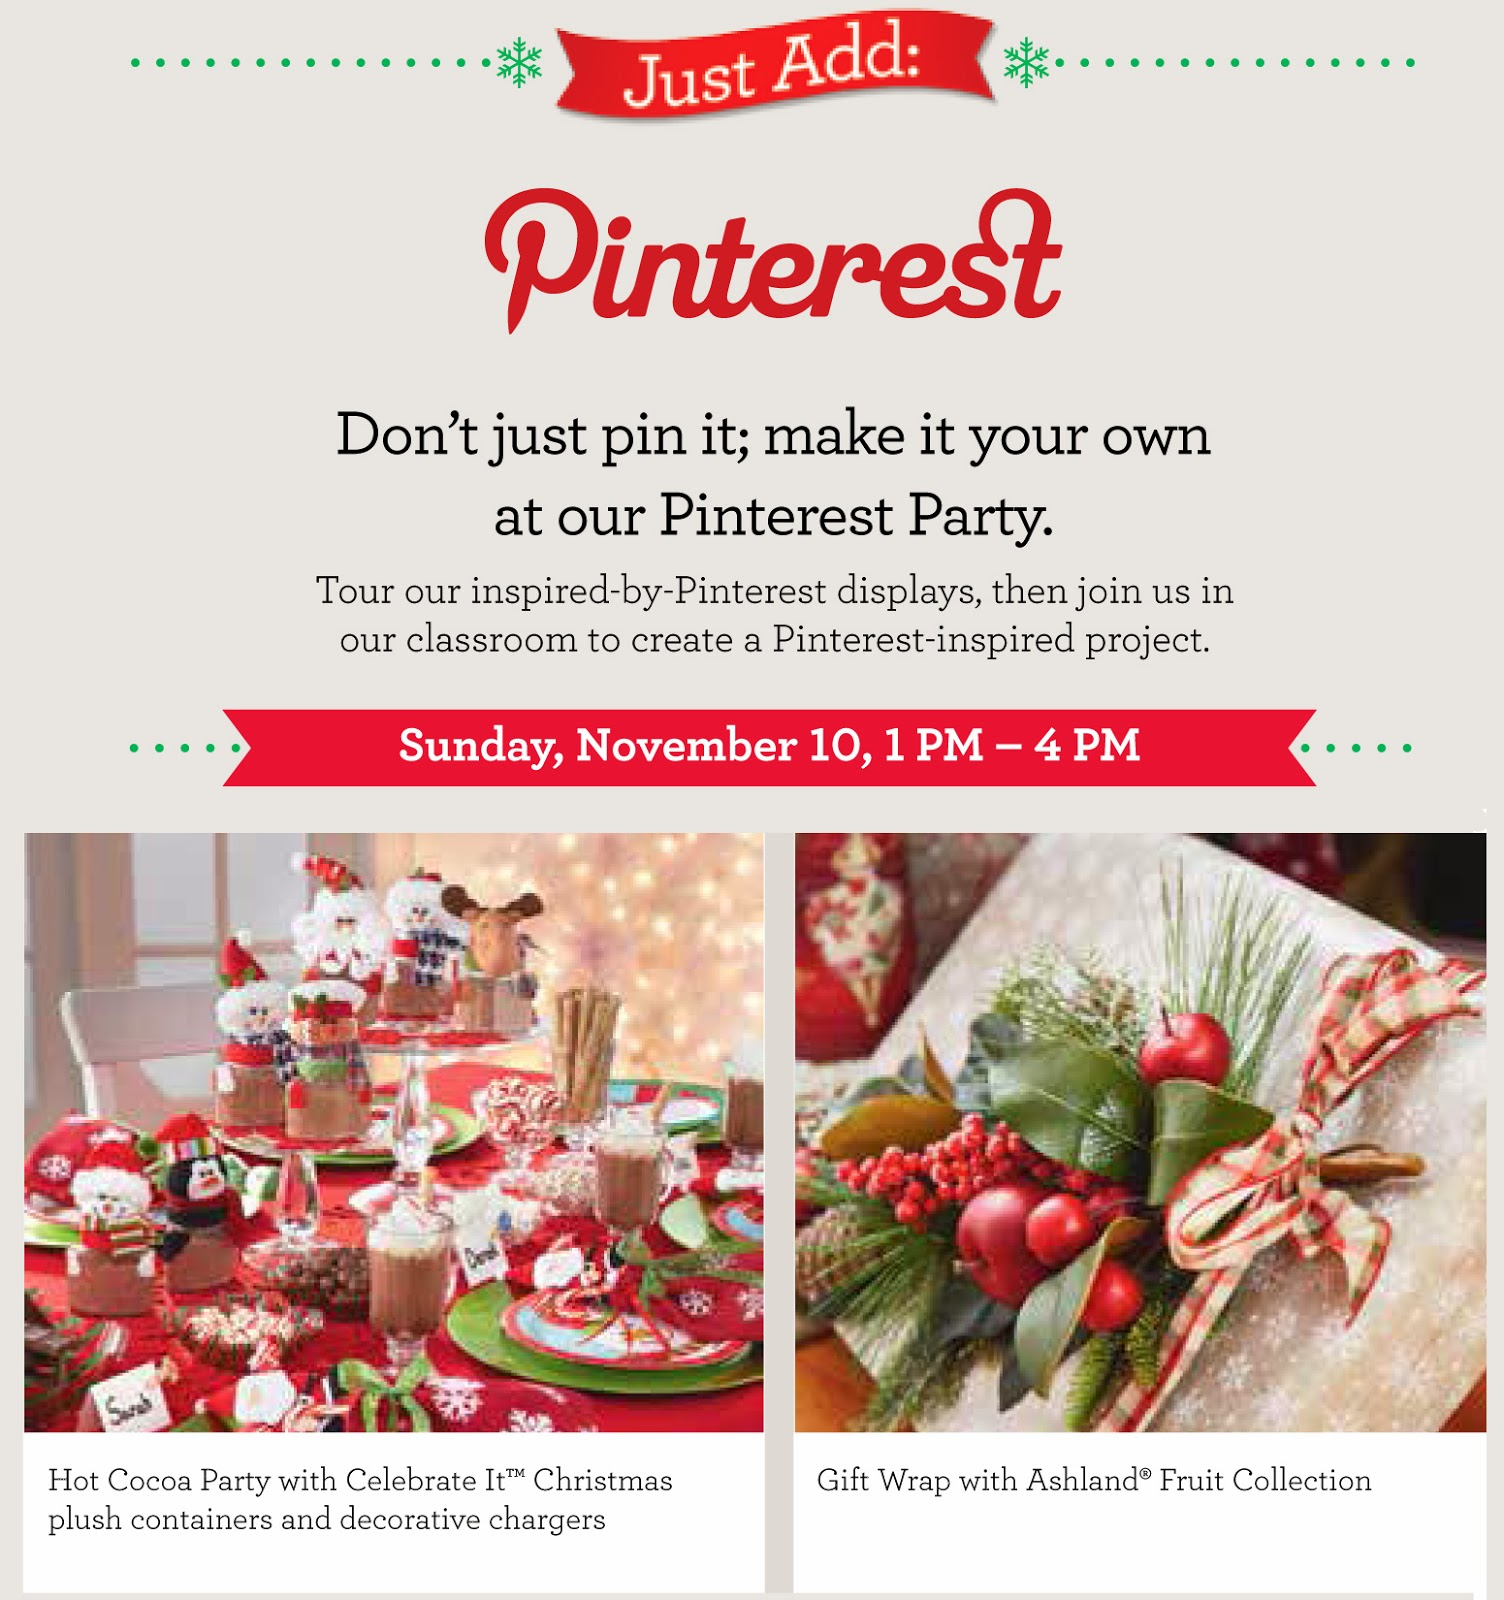 SCRAPS of (my) Life: Michaels Stores: Pinterest Party (Nov